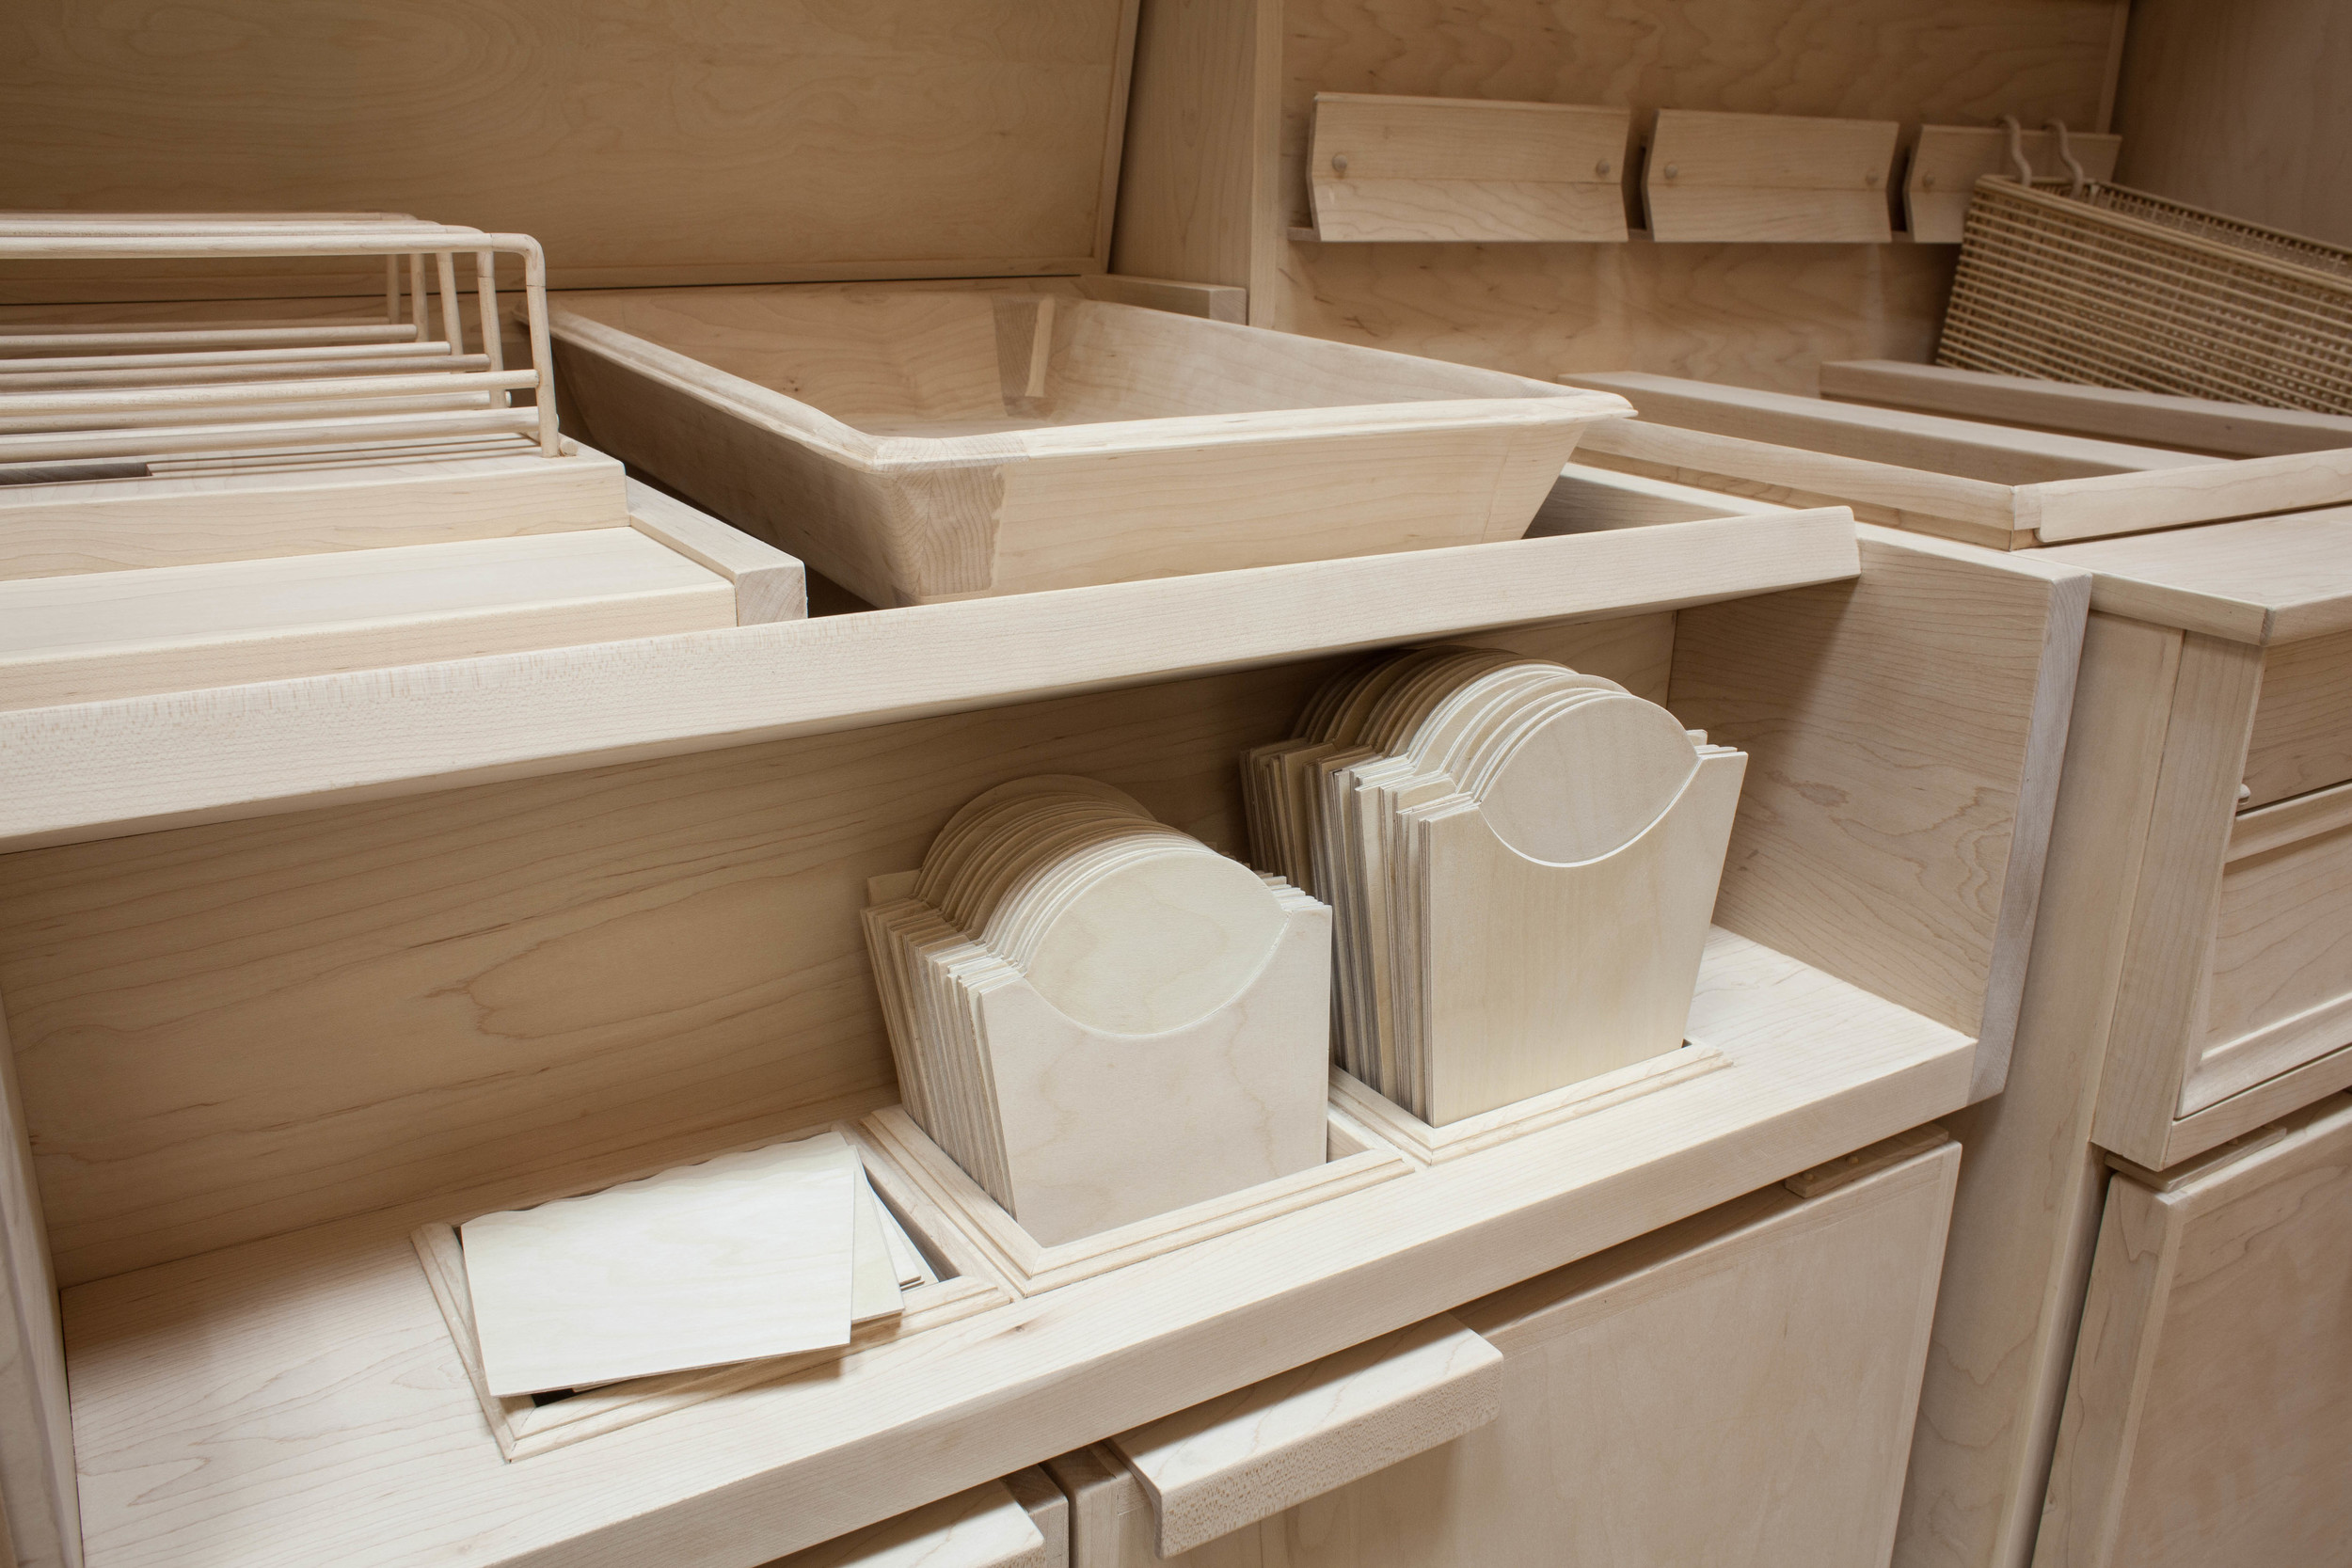 Apparatus-Interiors-25-300.jpg